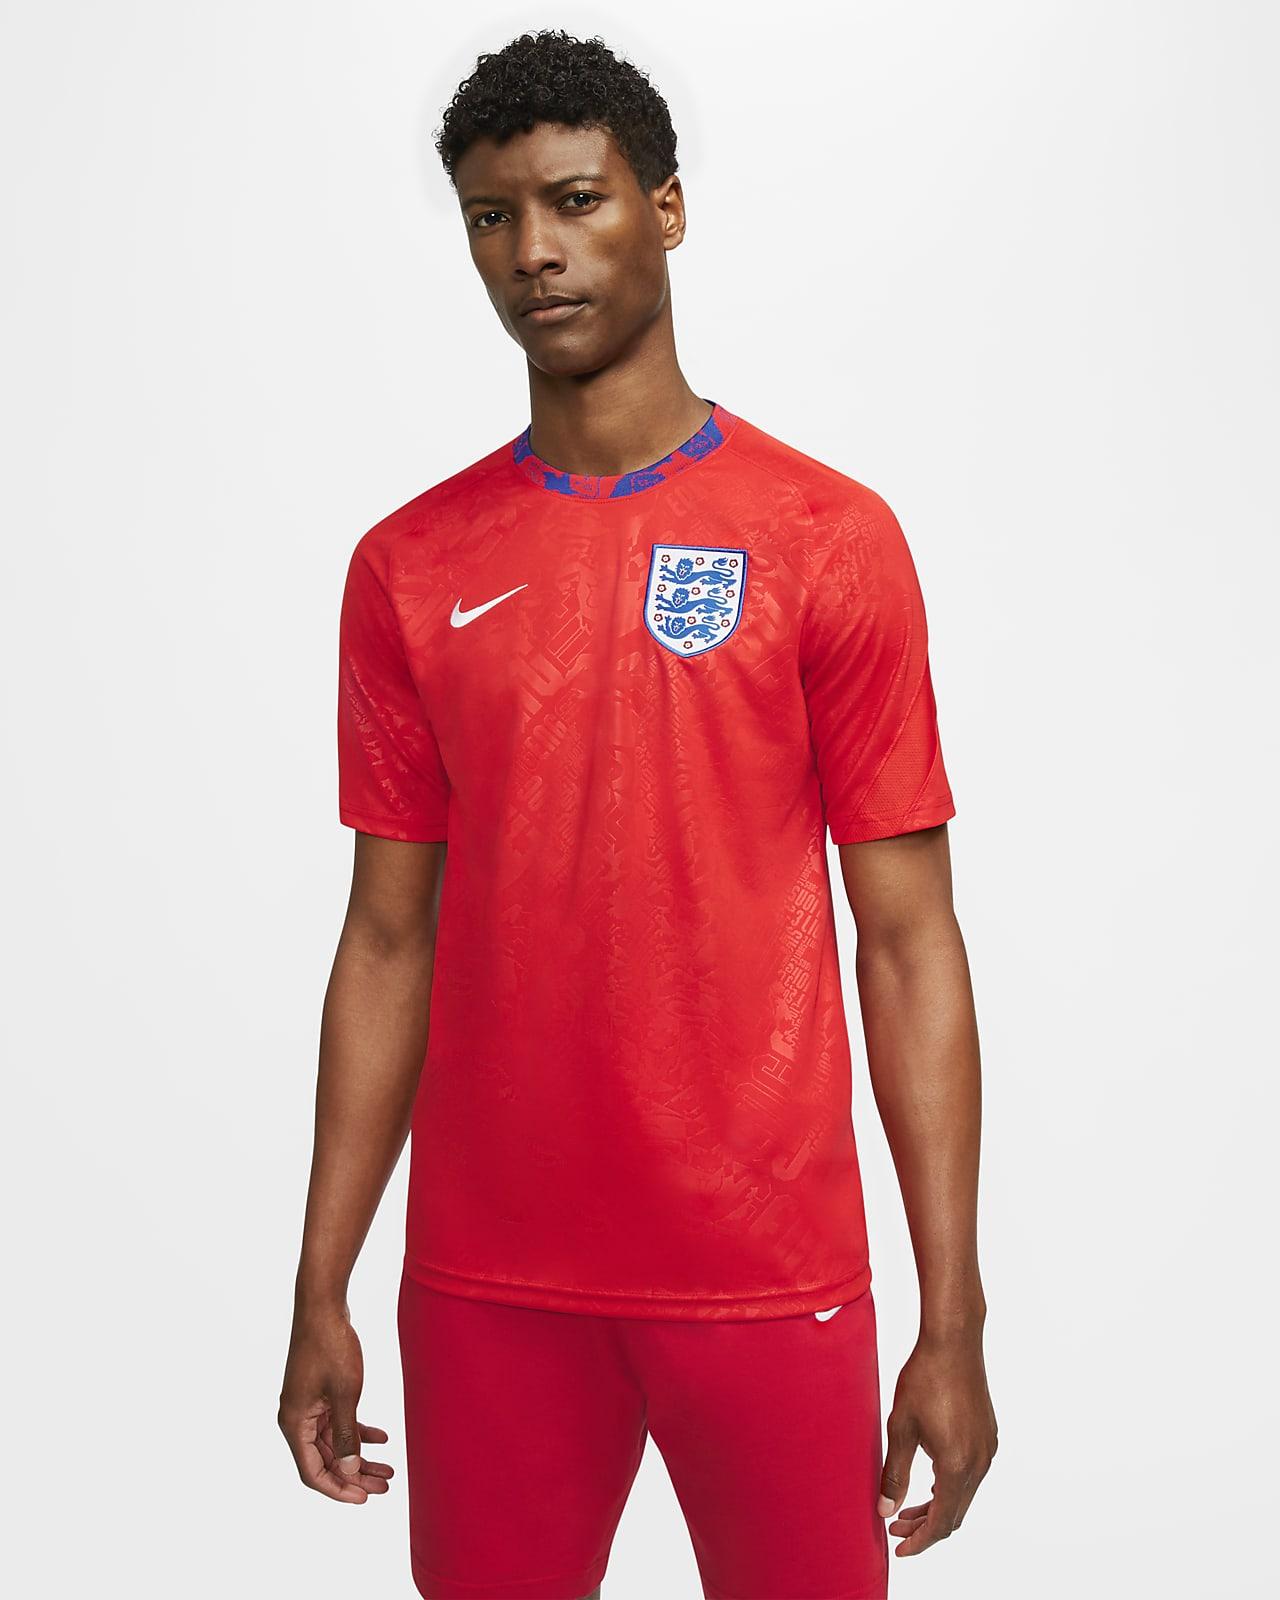 England Men's Short-Sleeve Football Top